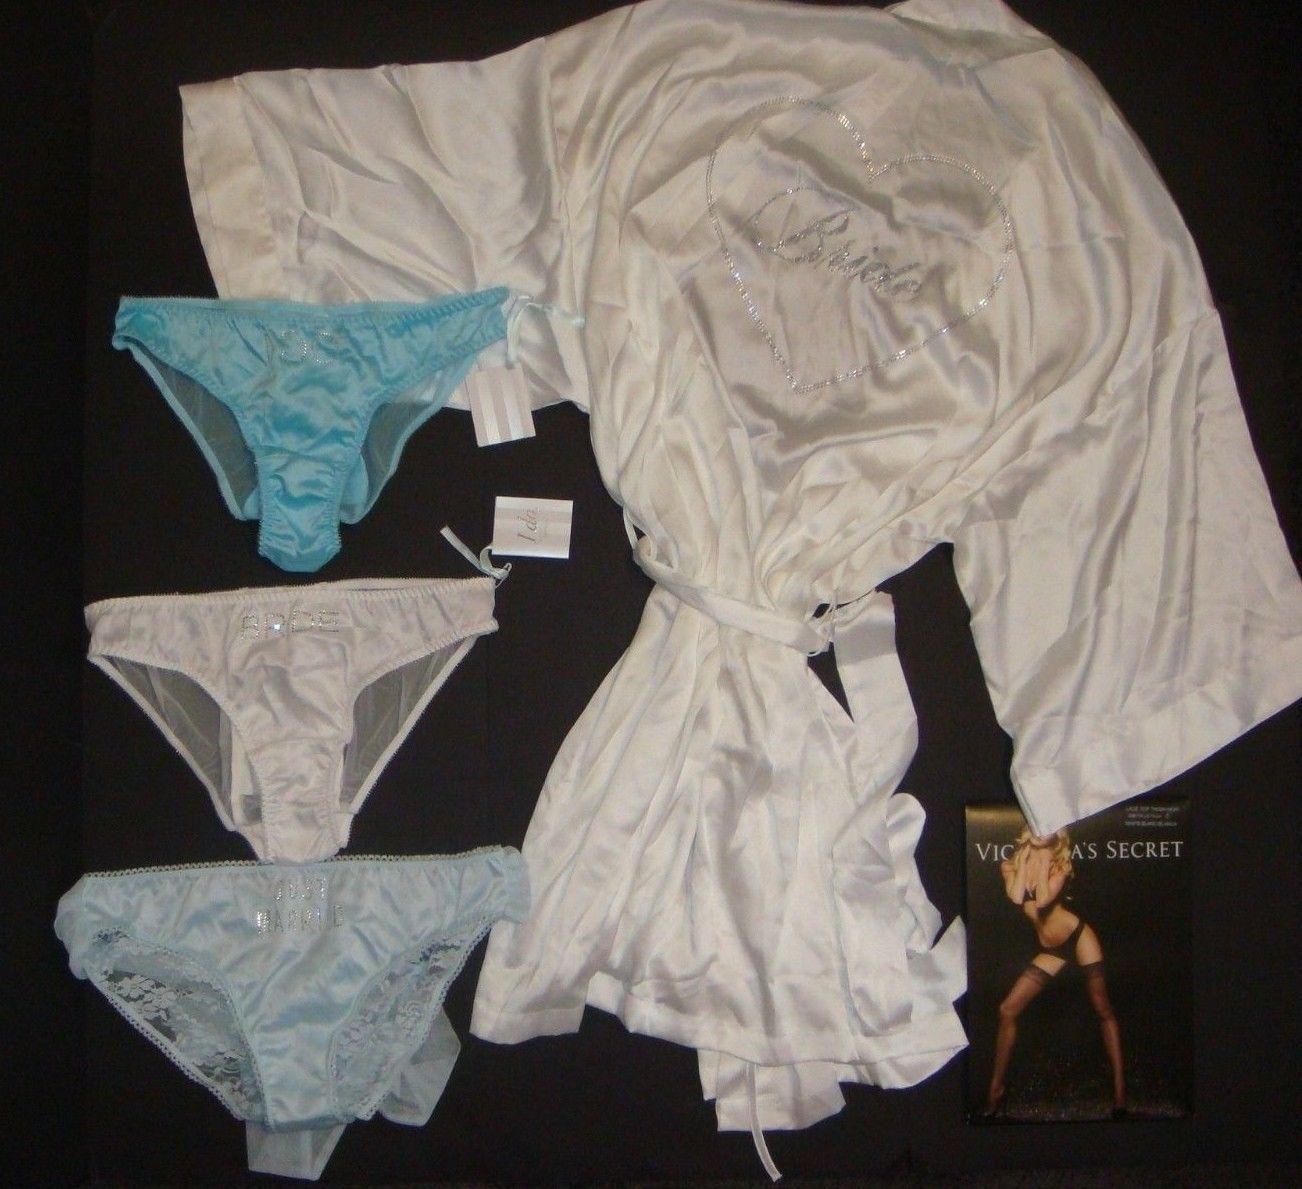 8da3085fe7 S l1600. S l1600. Previous. NWT Victoria s Secret ROBE+M panty BRIDAL bow blue  white BRIDE Just Married I DO